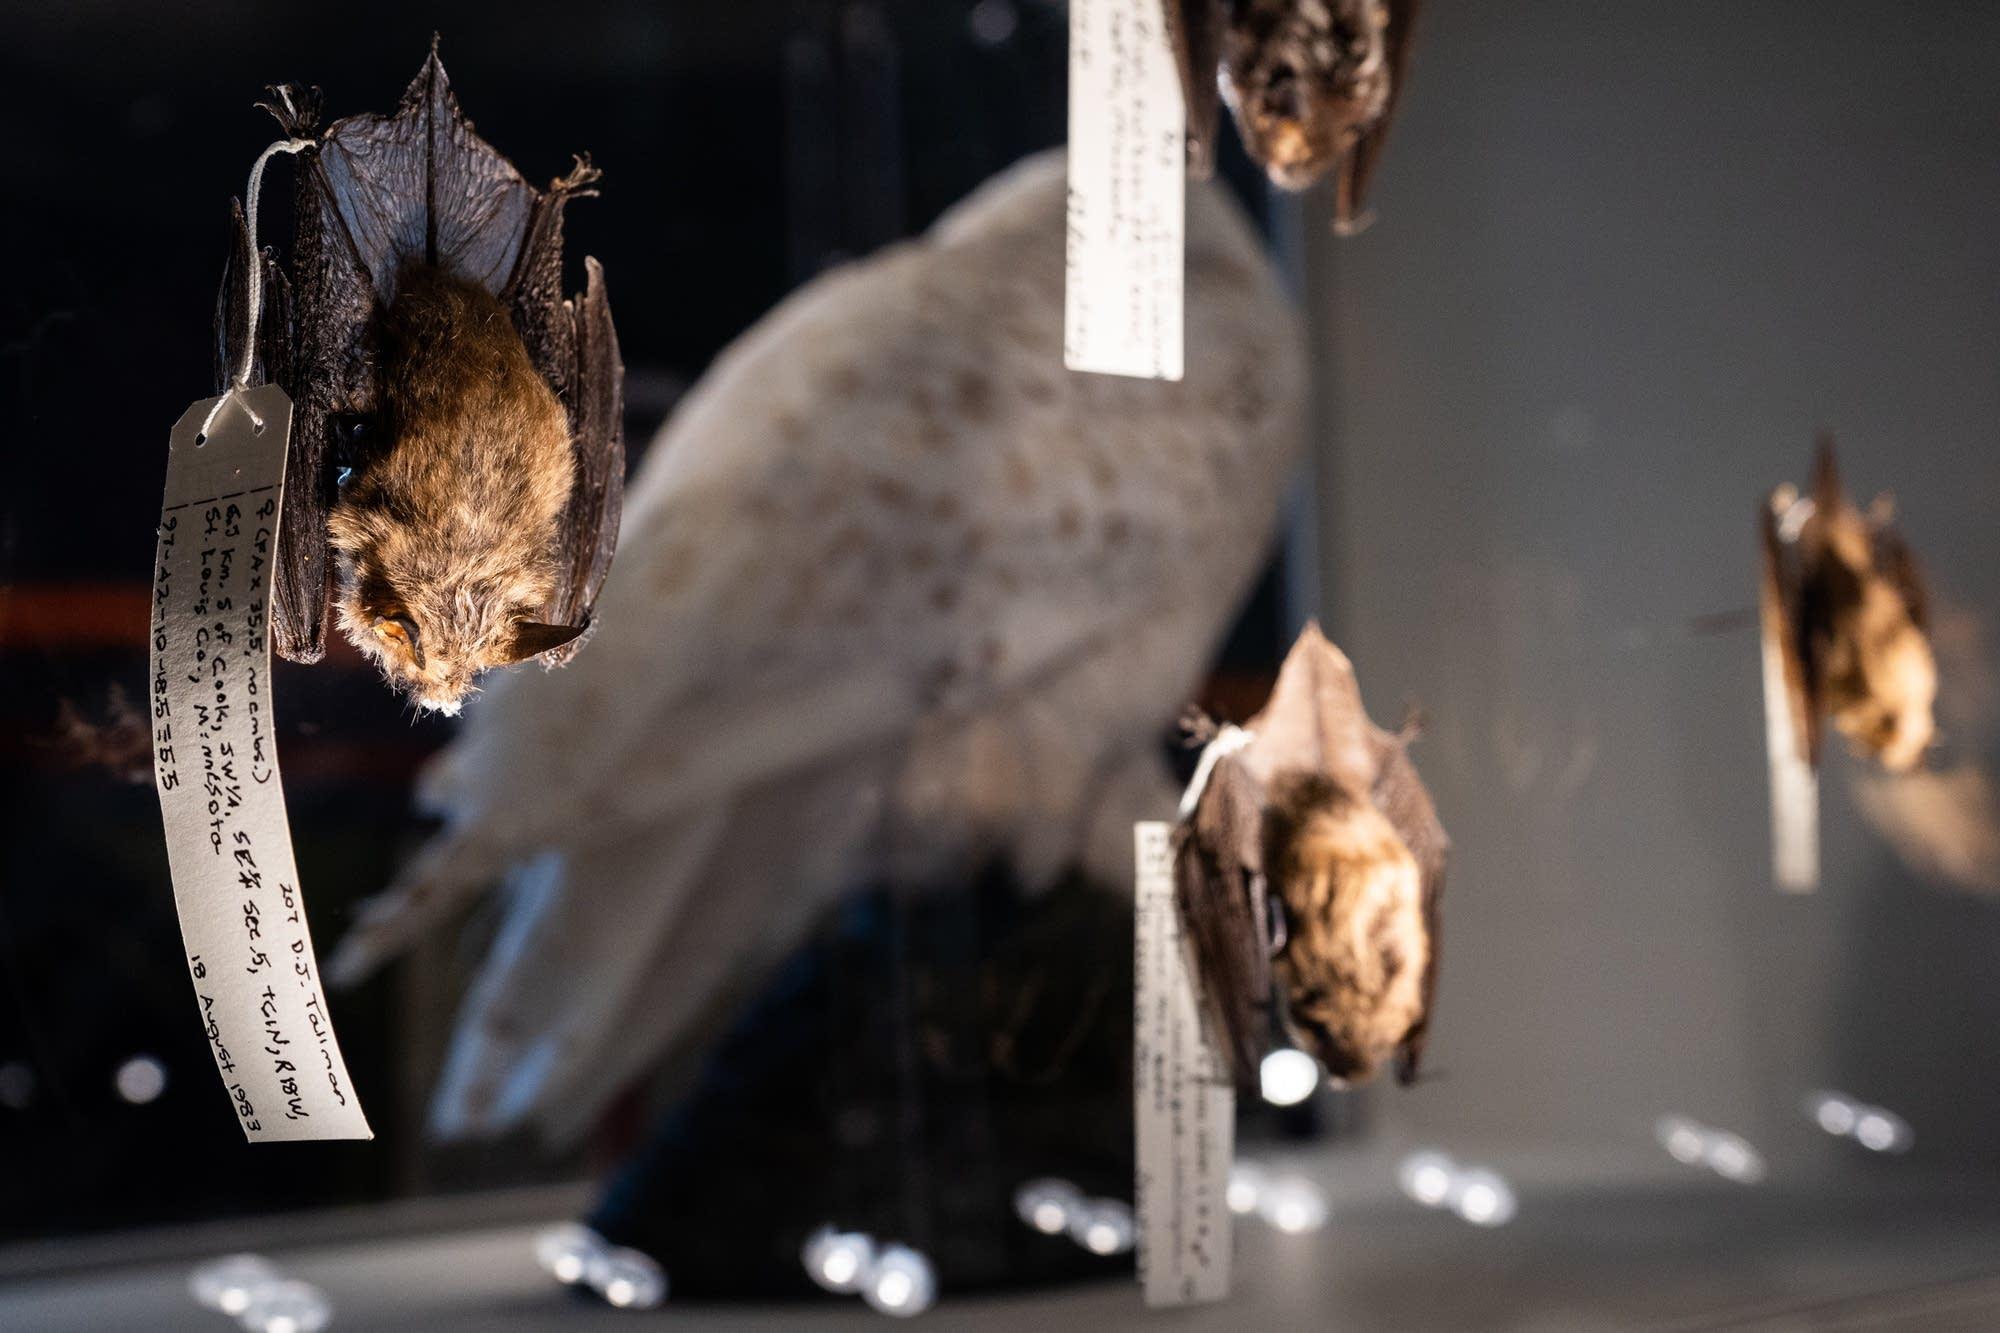 A northern long-eared bat hangs in an exhibit.